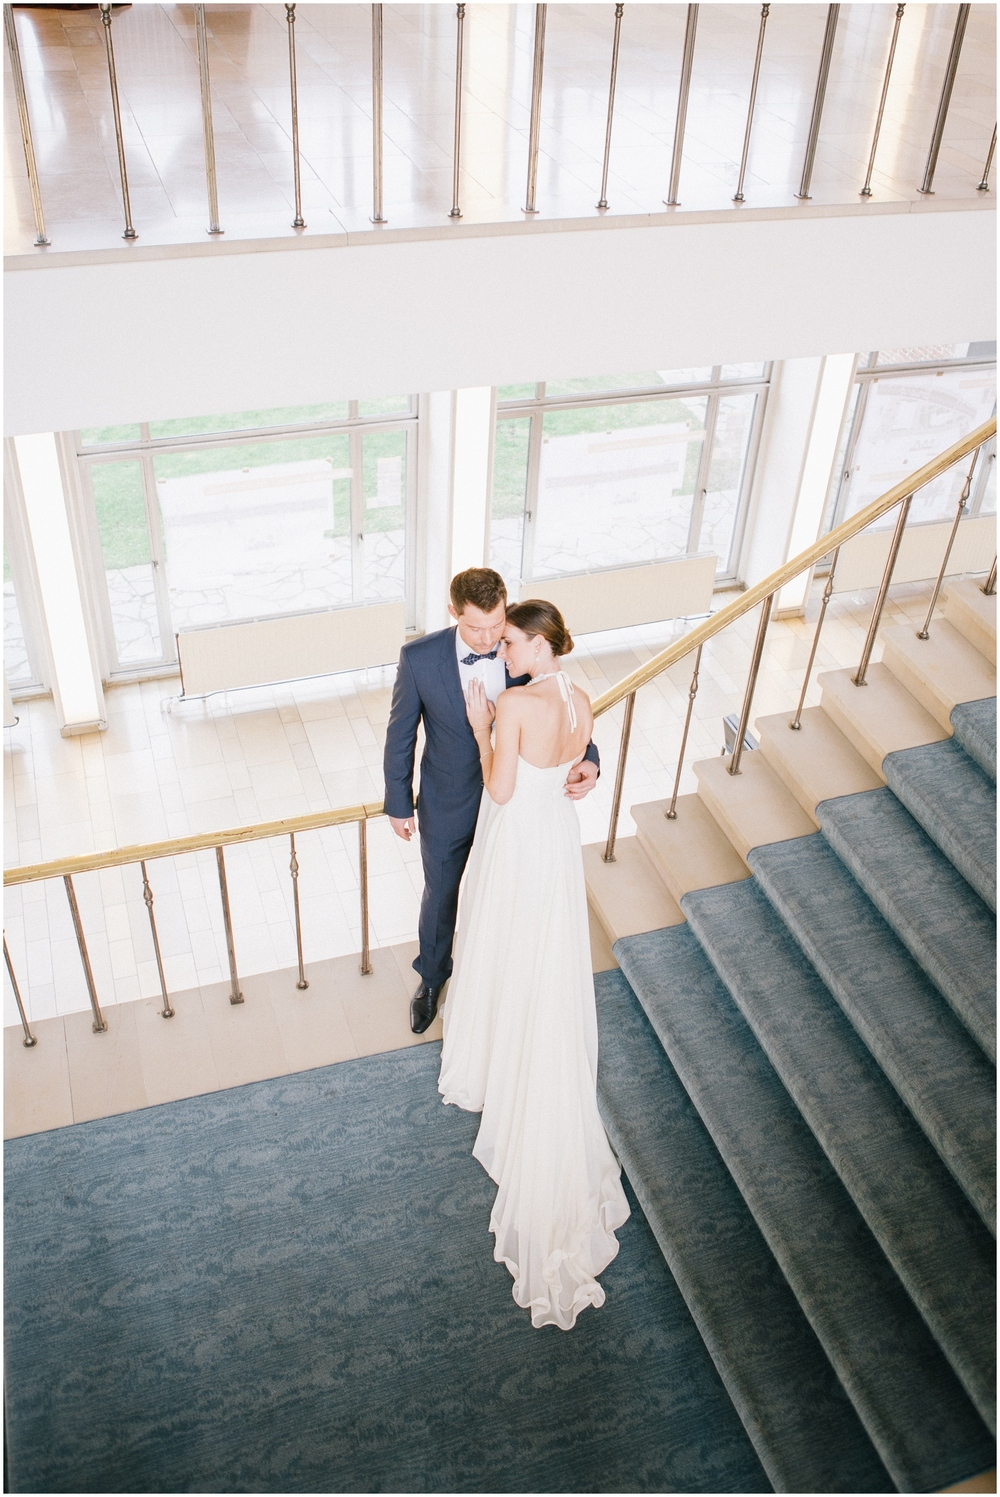 huwelijksfotograaf-merksem-E10-hoeve-010.jpg